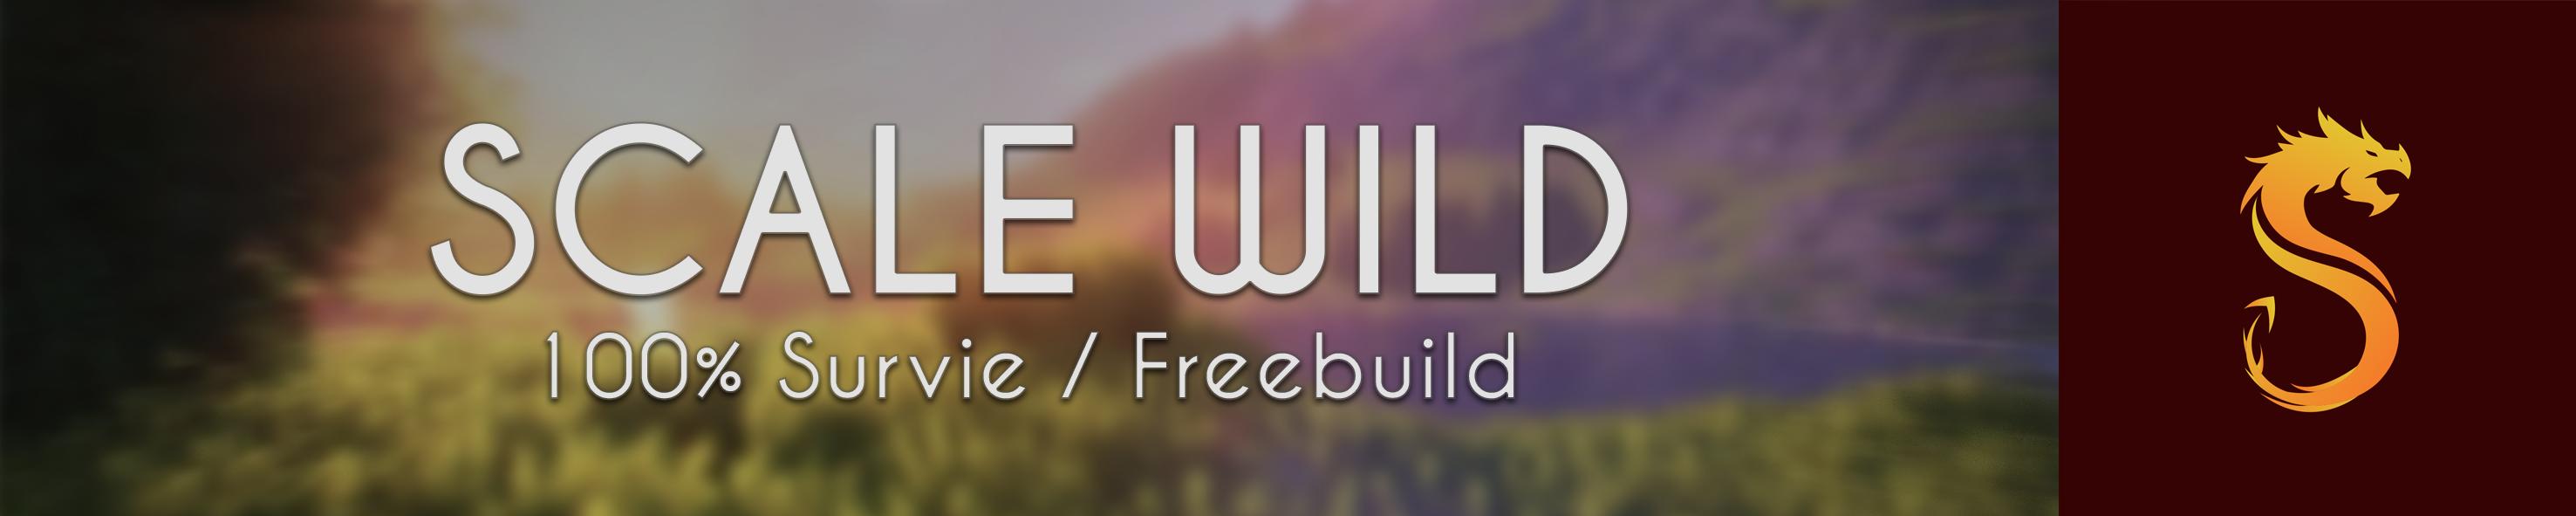 ScaleWild